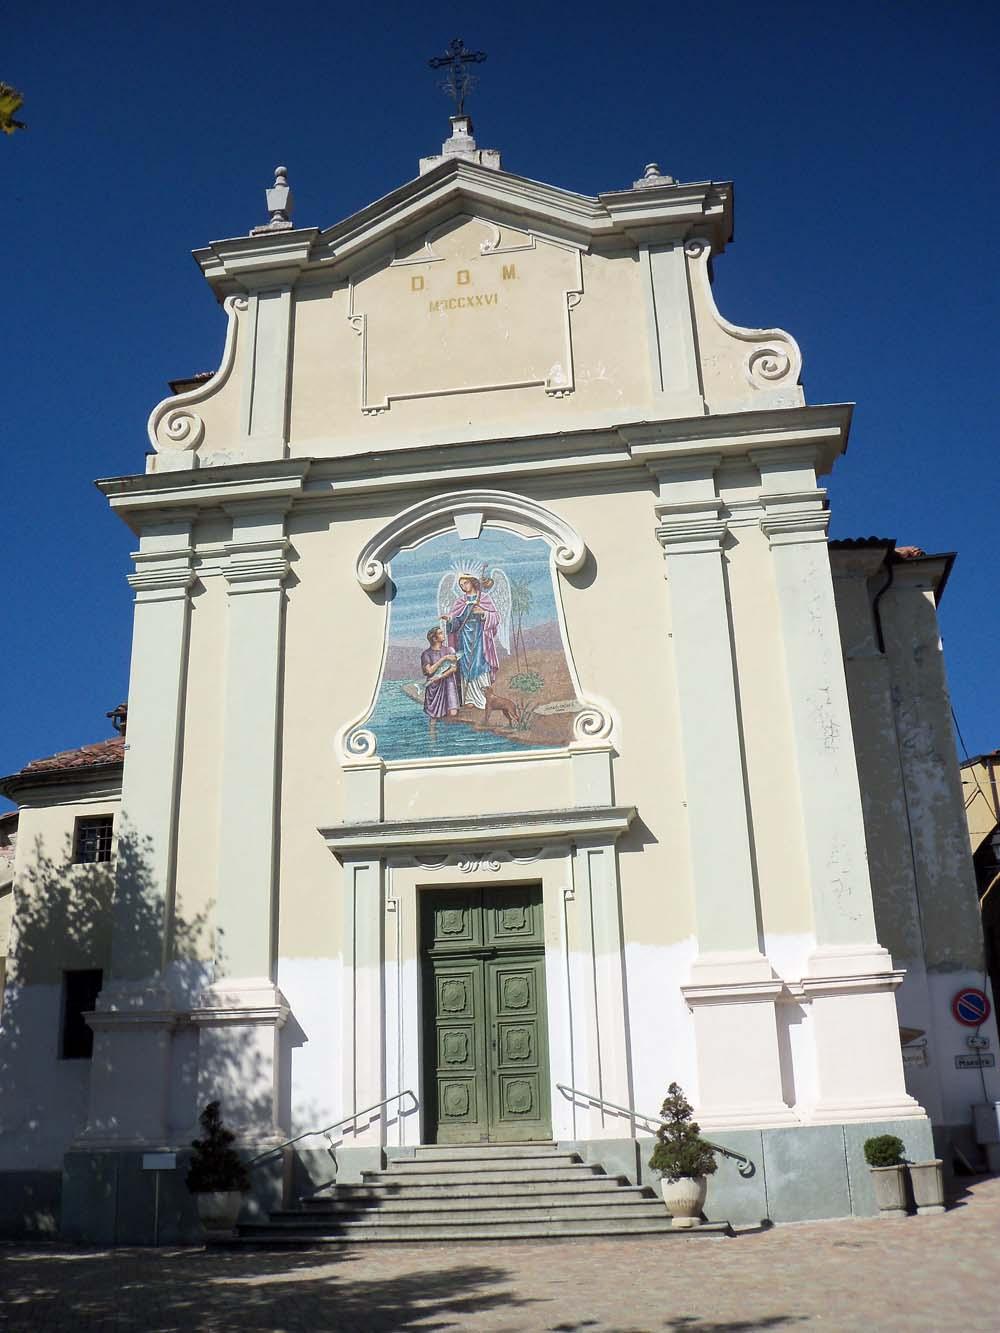 Parrocchia di Sacro Cuore di Gesu' e S.Raffaele